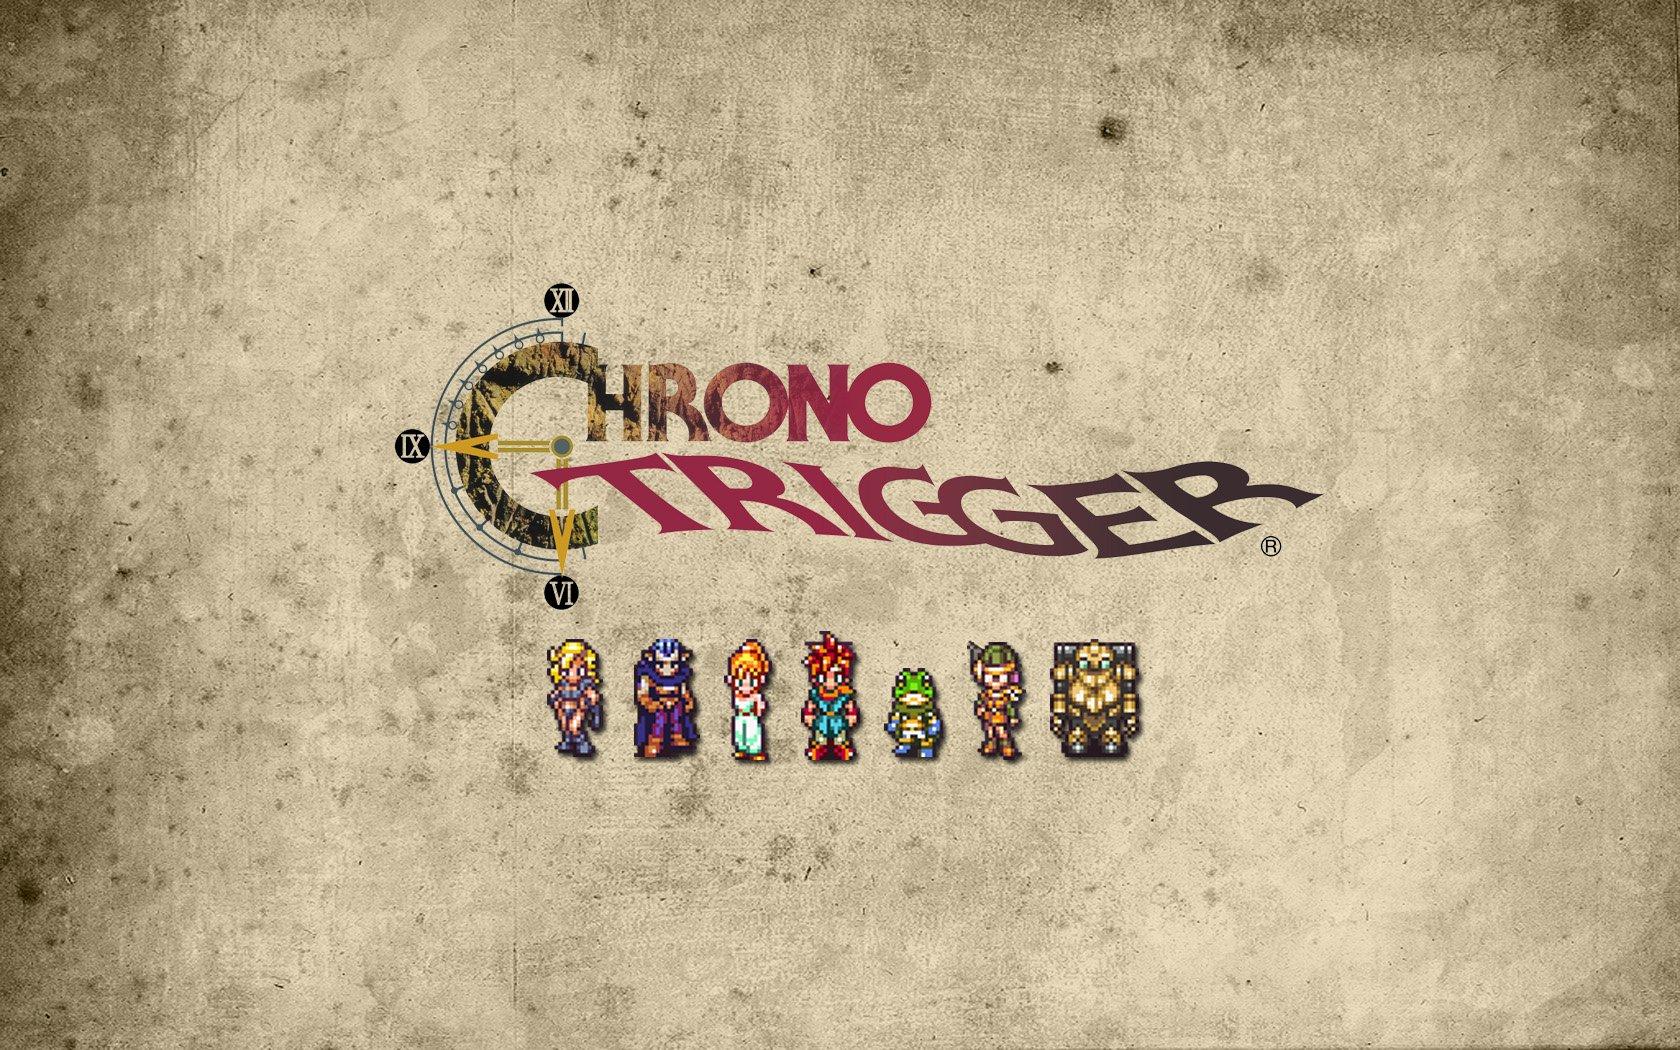 Video Game - Chrono Trigger  Wallpaper